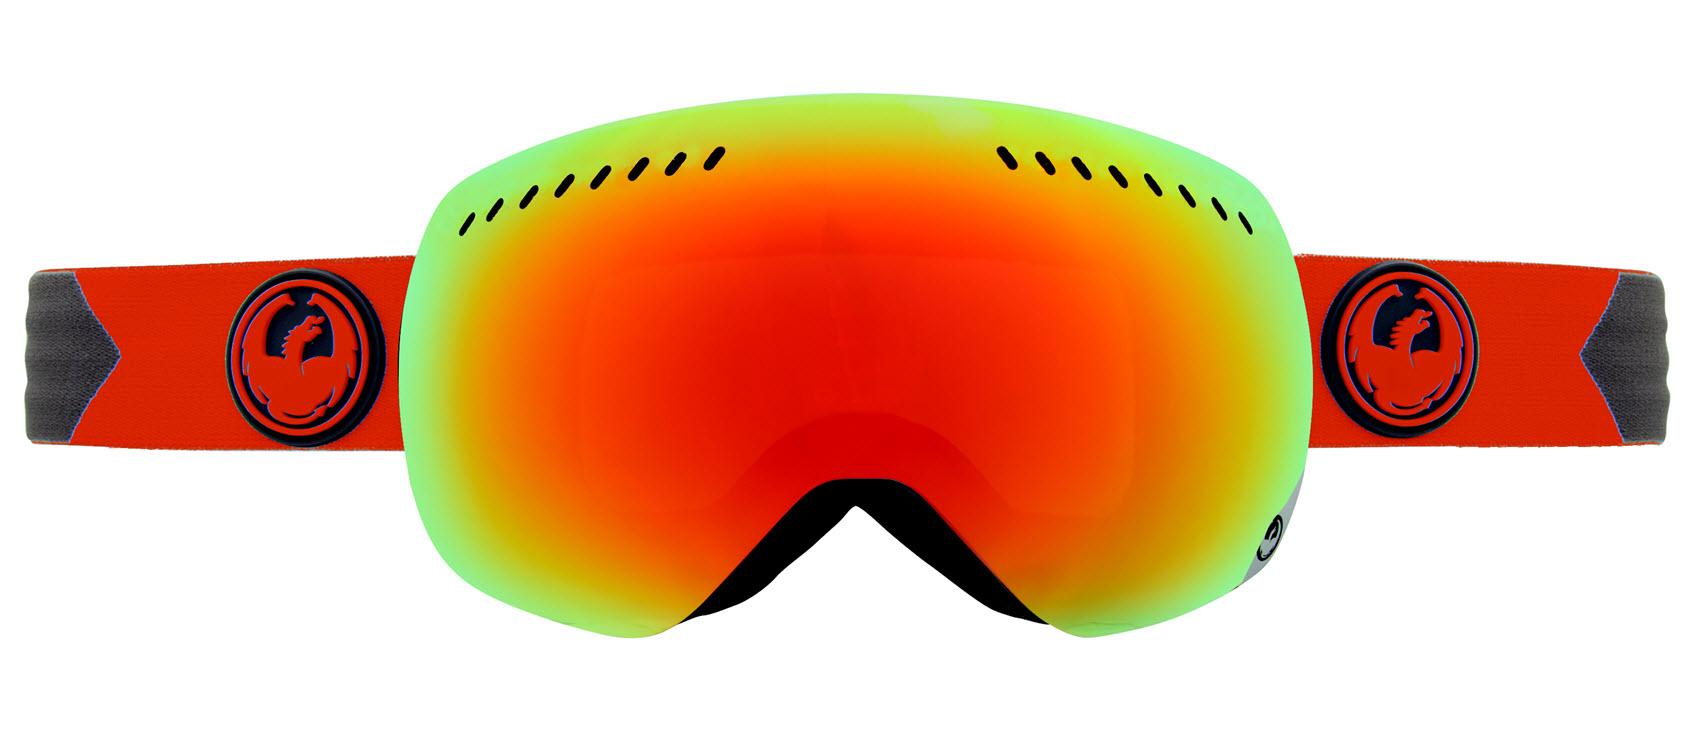 best ski goggles 2015  Dragon APXS Snowboard Ski Goggles 2015 Ex Display Various Colurs ...